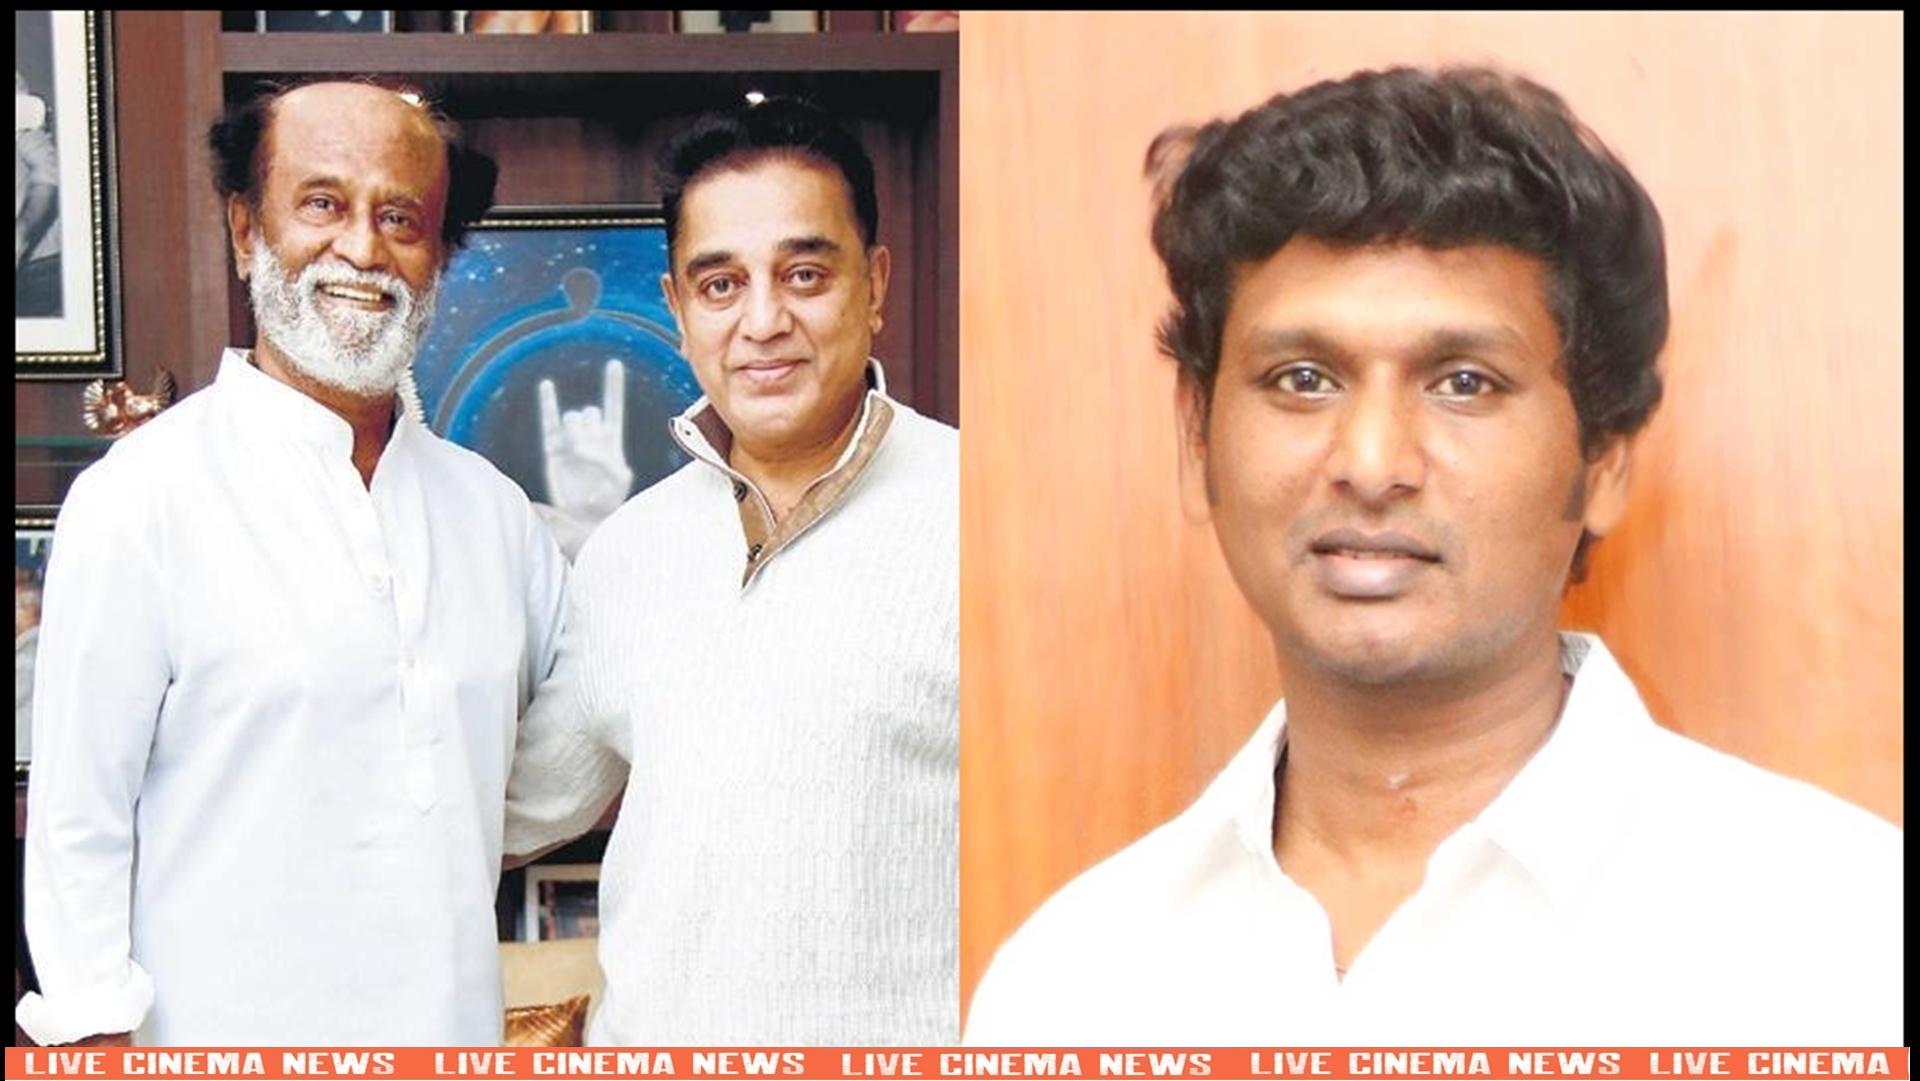 Rajinikanth collaborates with Kamal Haasan in the Lokesh Kanagaraj directorial